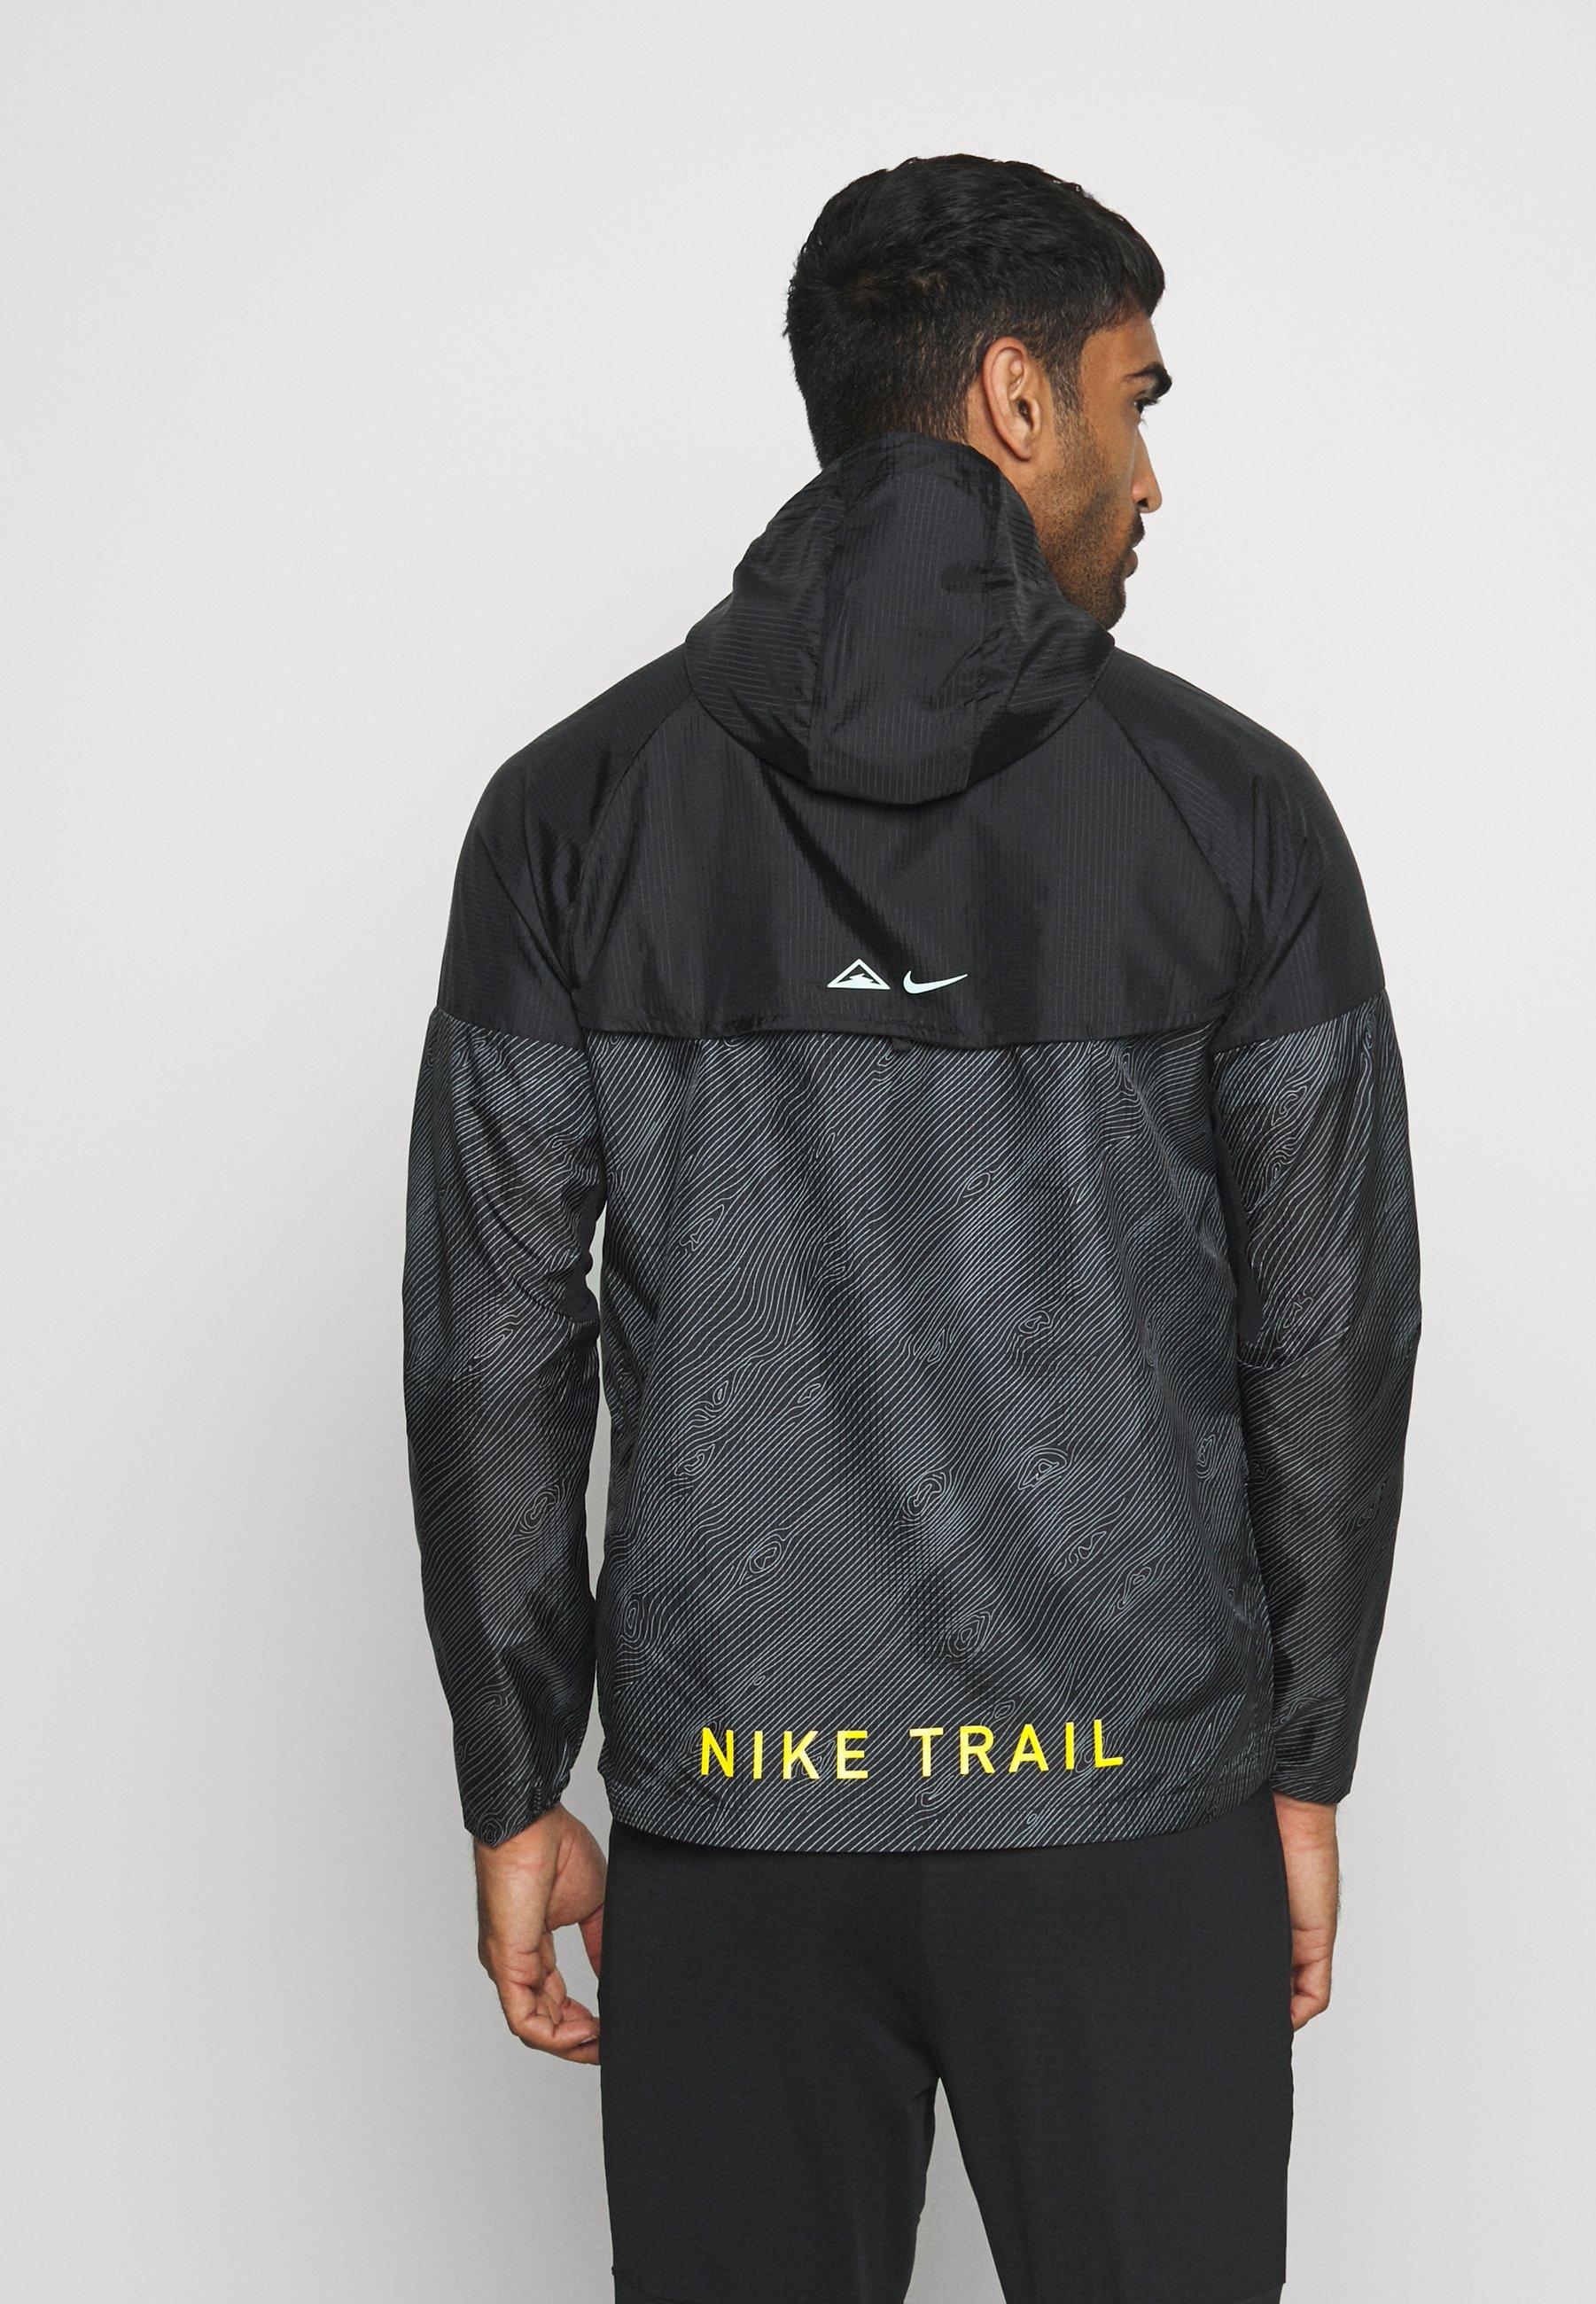 Ny Online Butik Tøj til herrer Nike Performance TRAIL Windbreakers black/laser crimson 11RyGJ 4pFRc9